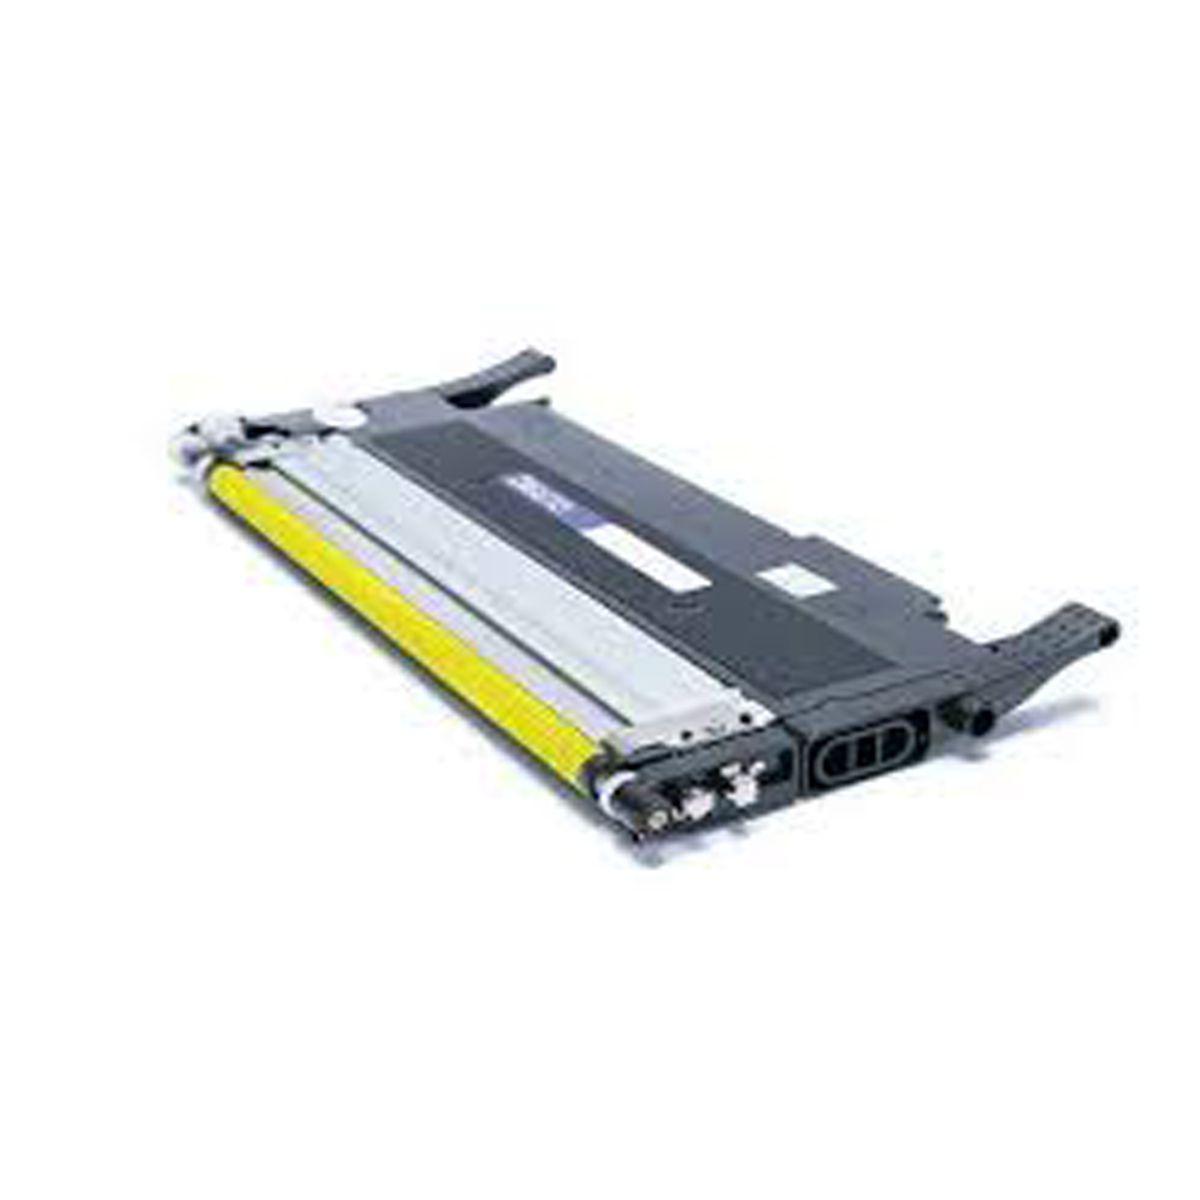 Toner Samsung CLT Y406S Amarelo - CLP360 CLP365 C460W - Compativel